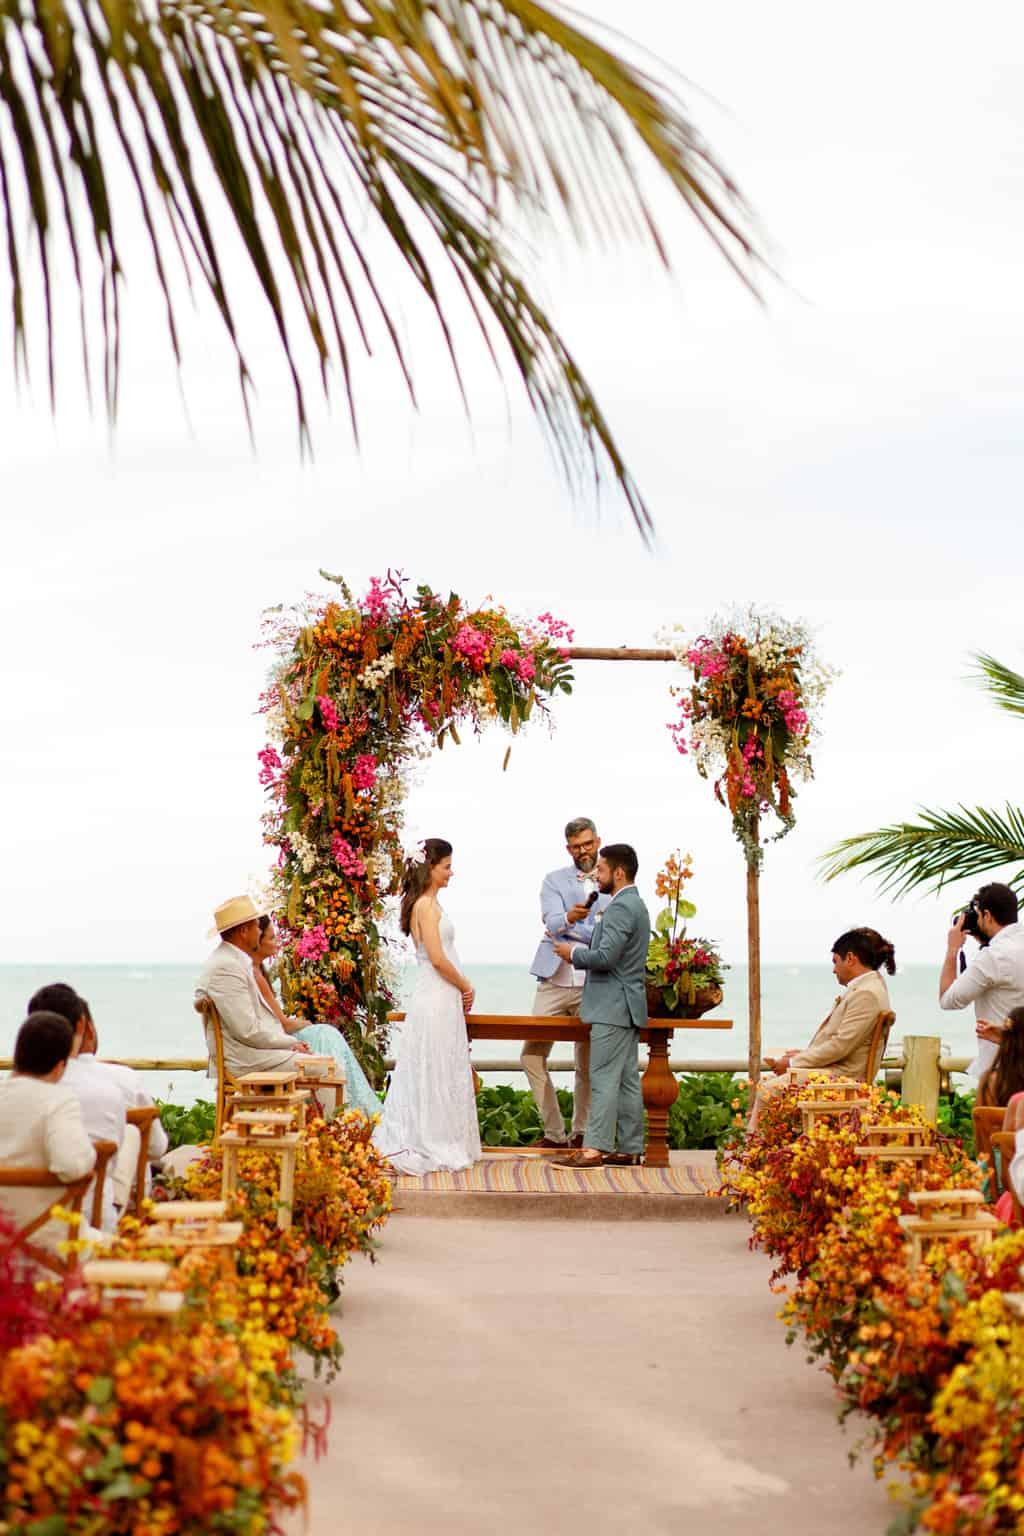 Casamento-Emanuelle-e-Alysson-Fotografia-Tadeu-Nanó-e-Luca-Antunes108